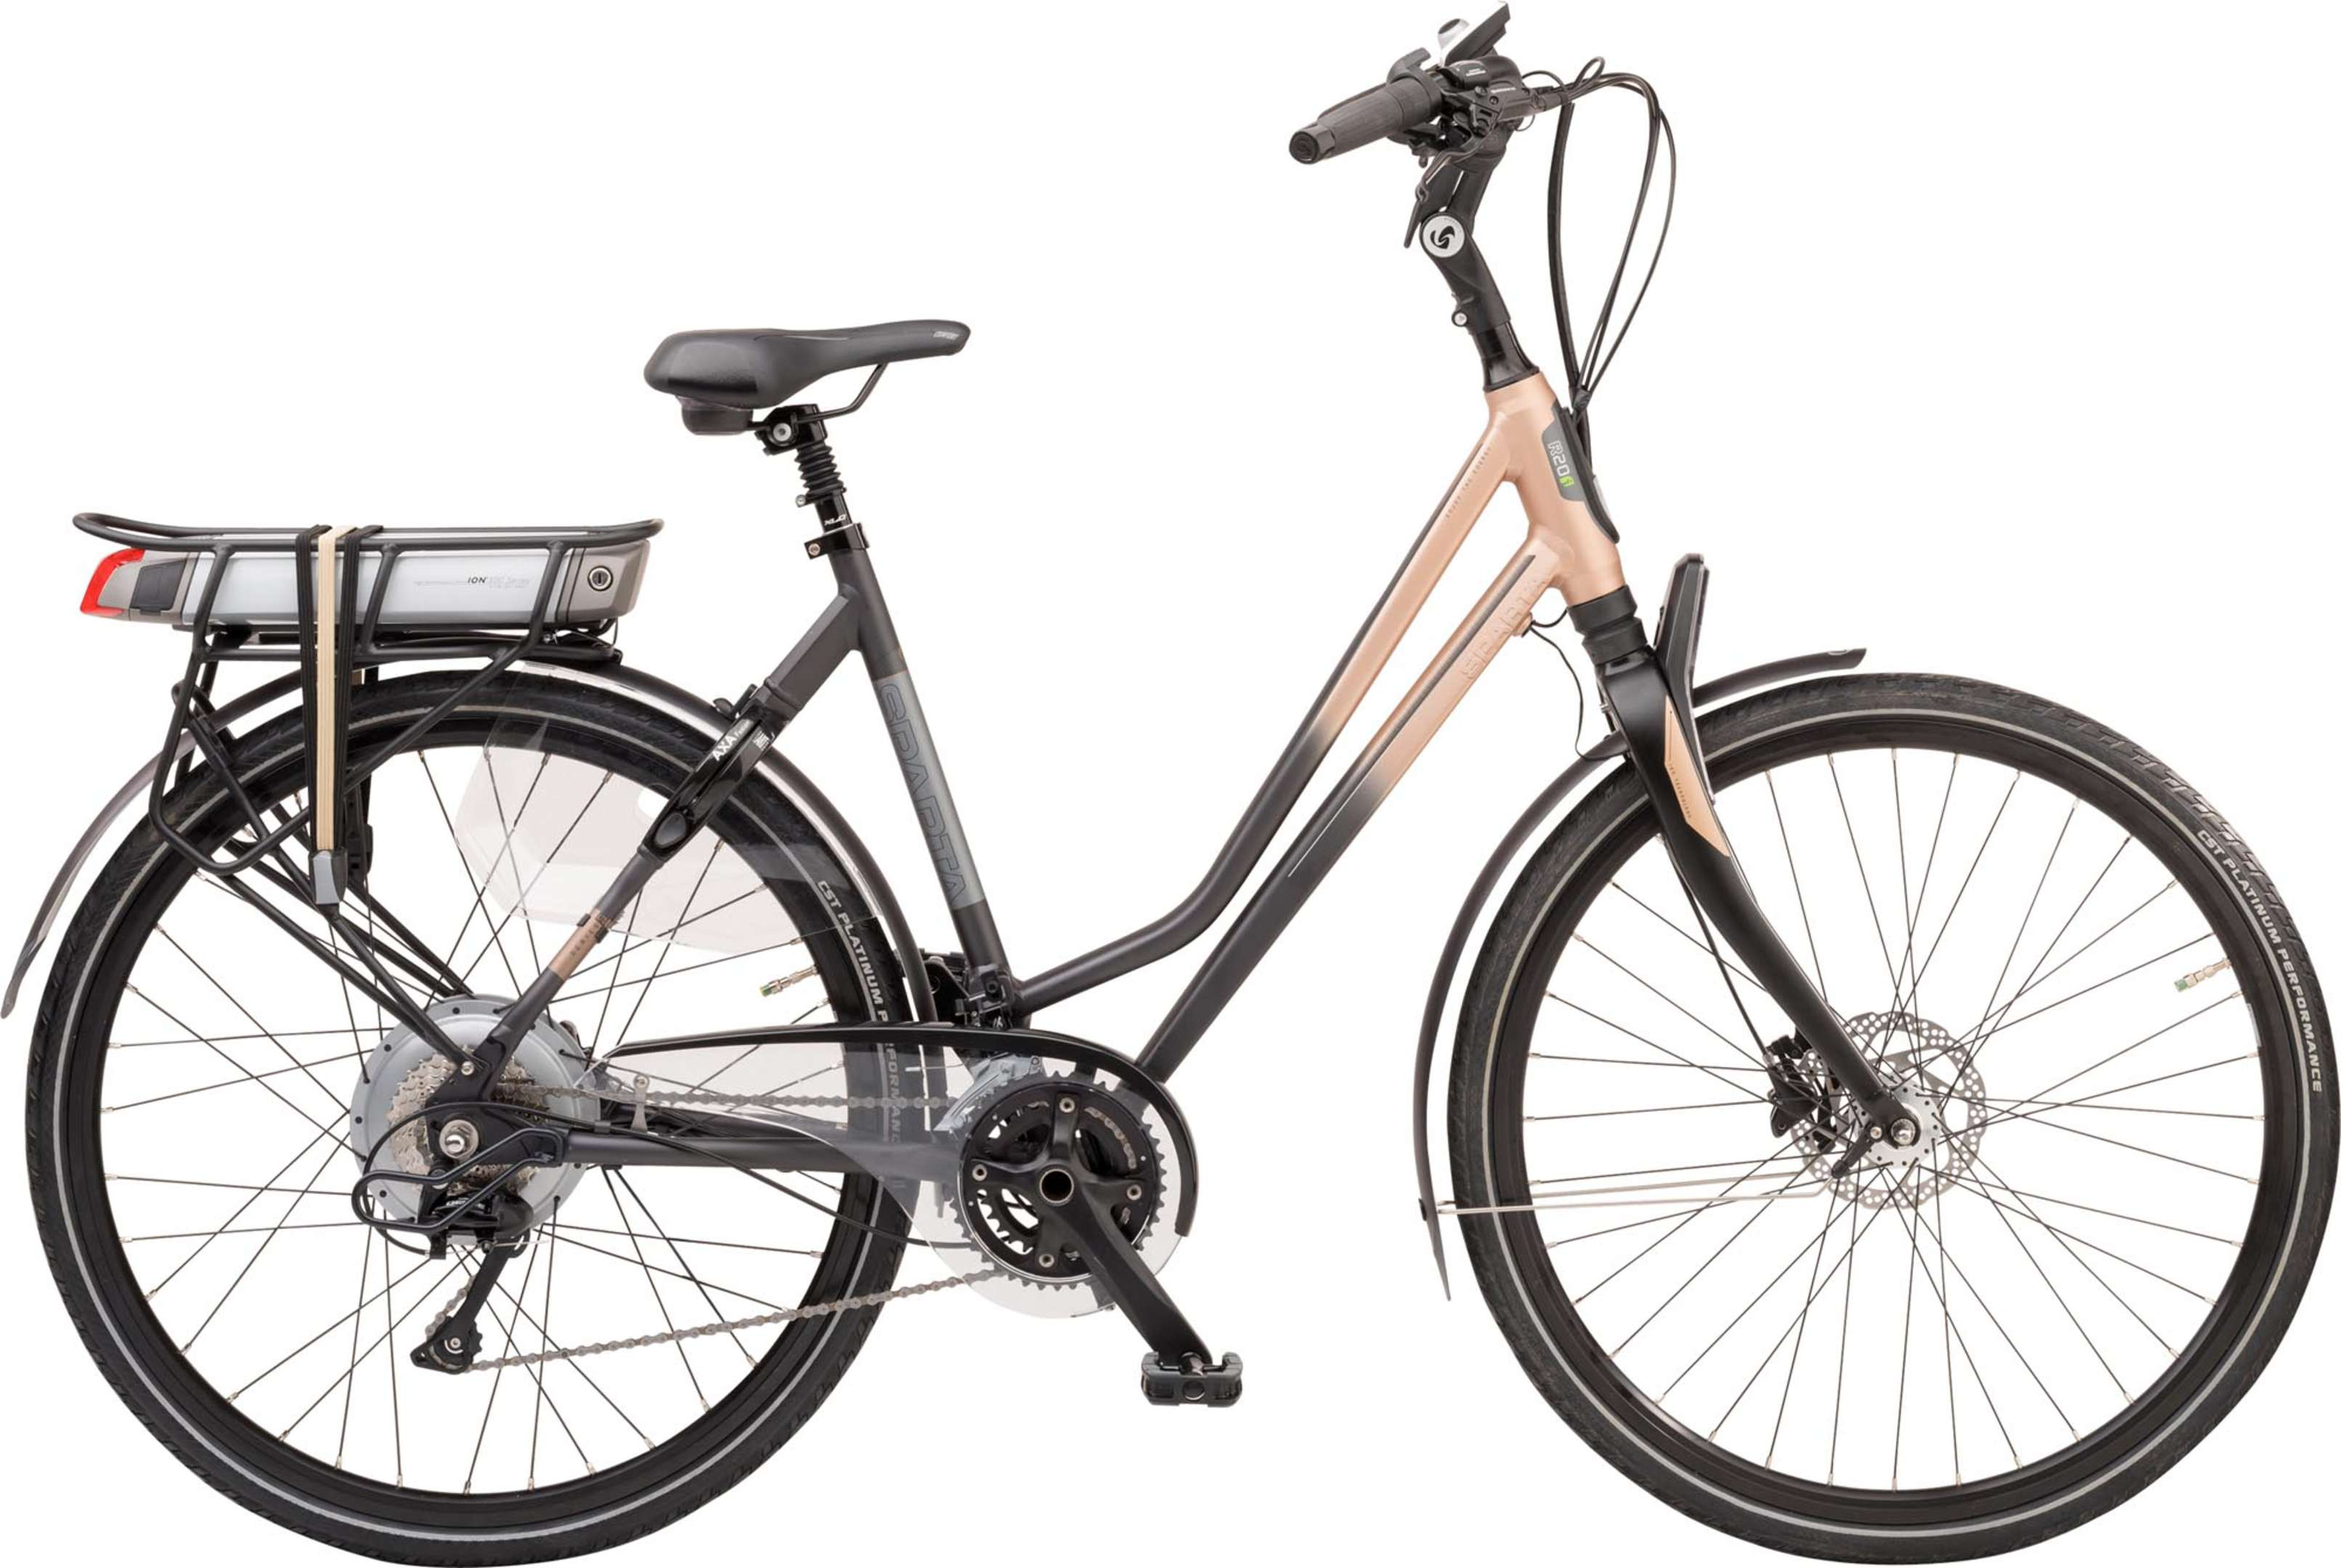 sparta r20i ltd eurorad bikeleasingeurorad bikeleasing. Black Bedroom Furniture Sets. Home Design Ideas